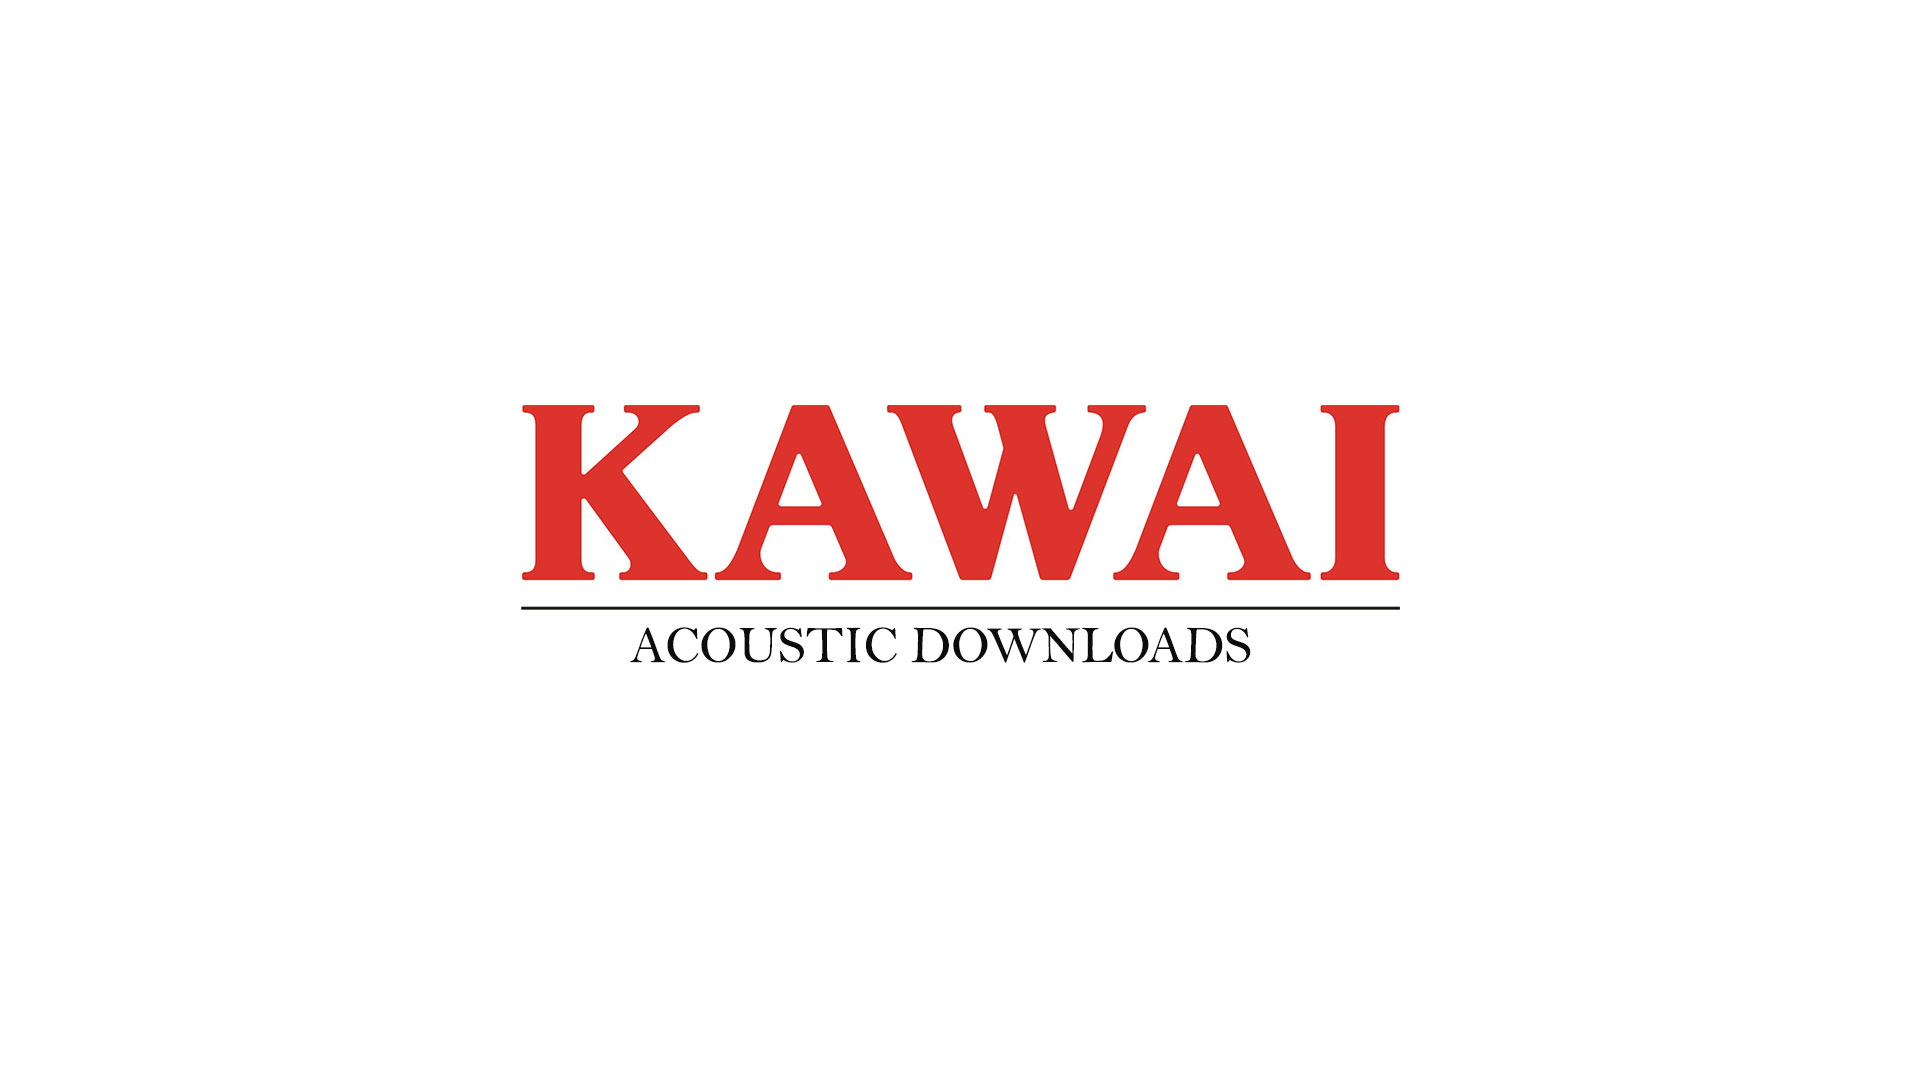 Kawai Acoustic Downloads